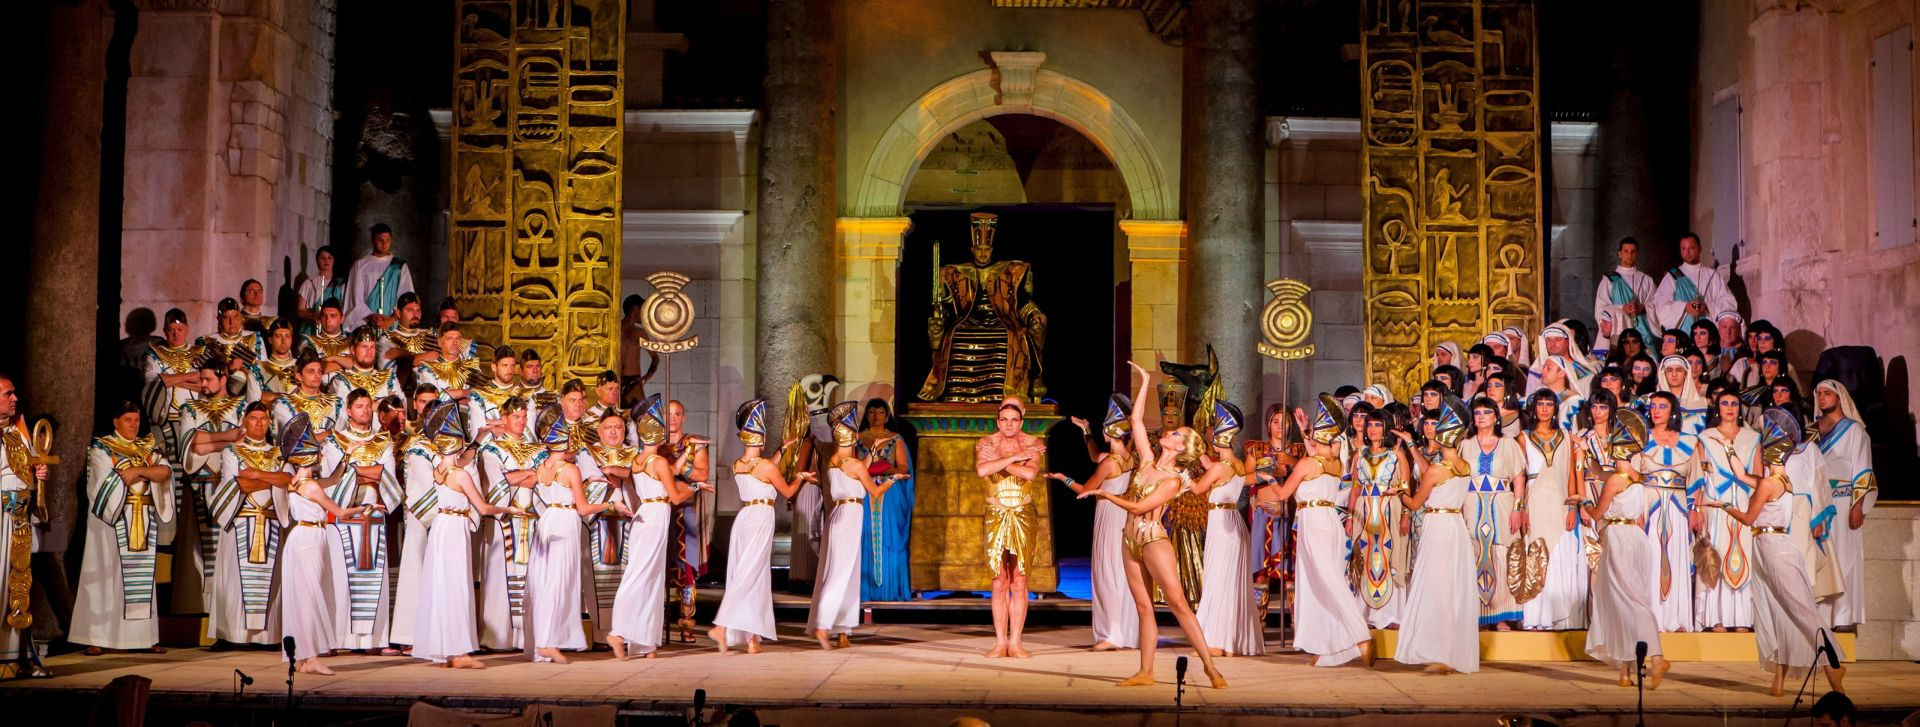 SPLITSKO LJETO Aida se i ove godine vraća na Peristil